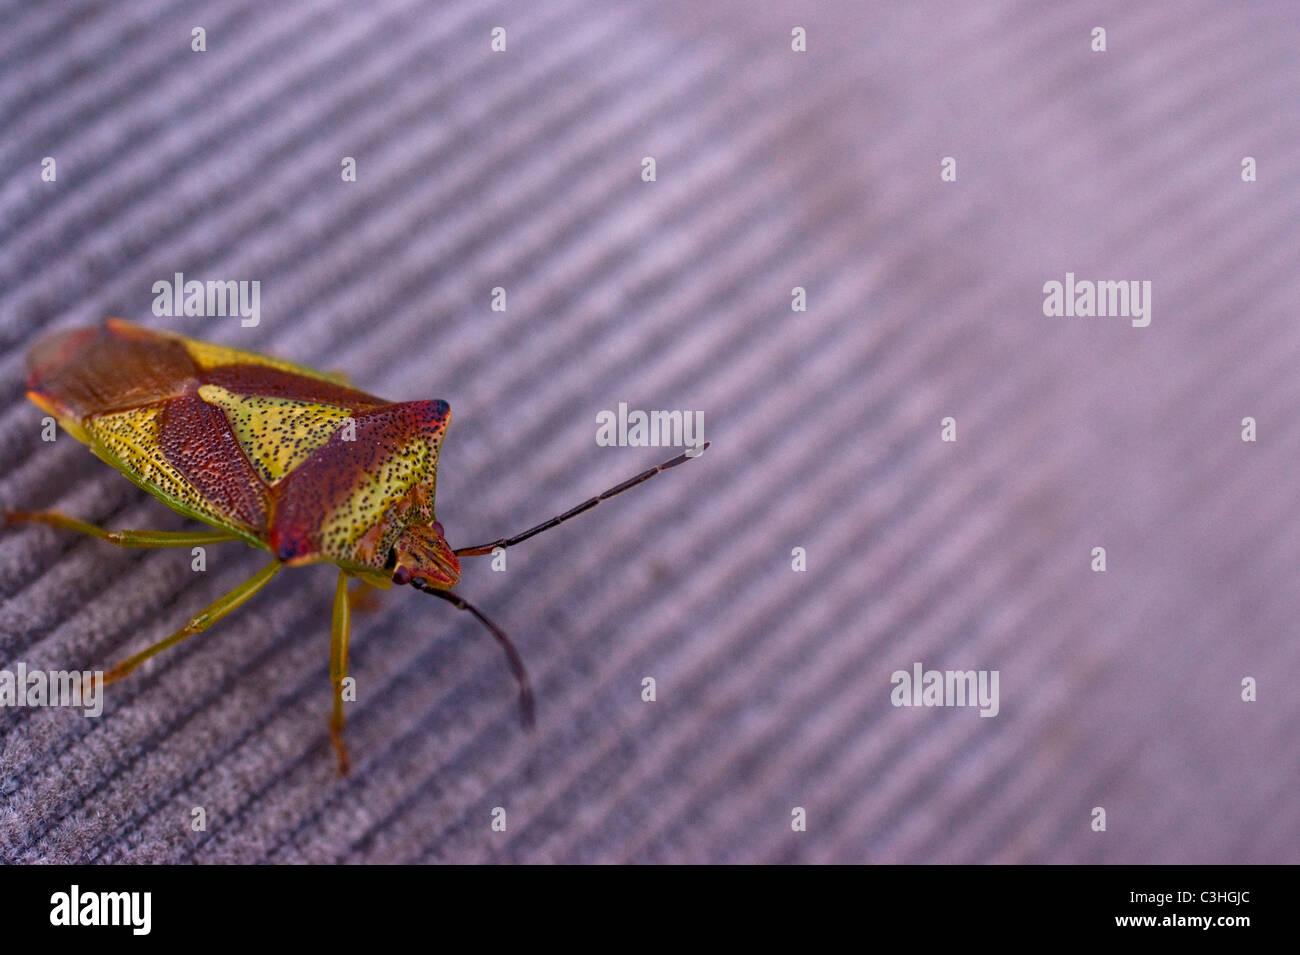 Hawthorn sheild bug - Stock Image